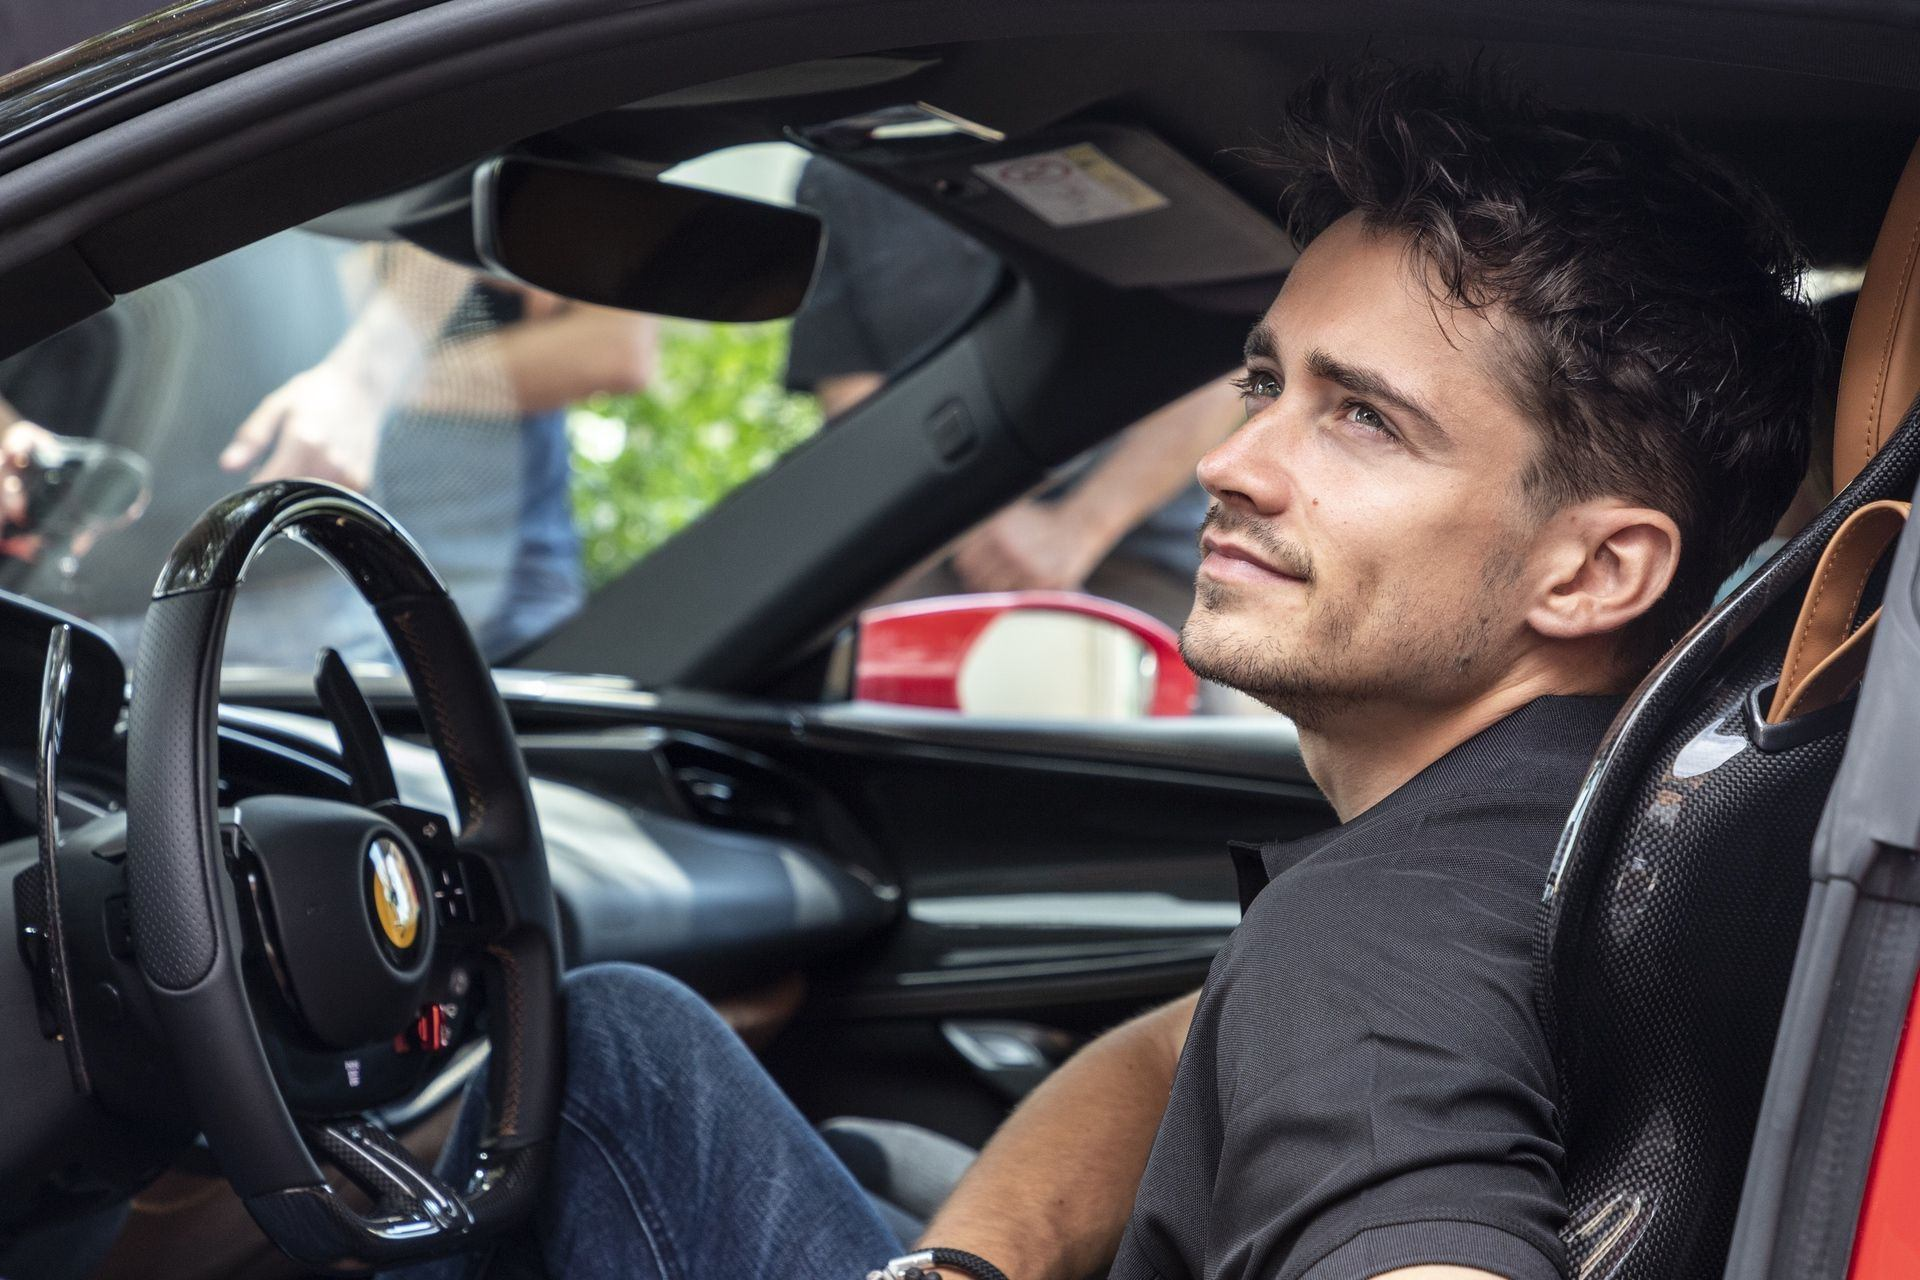 Ferrari_SF90_Stradale_Claude_Charles_Leclerc_Monaco_2020_0008